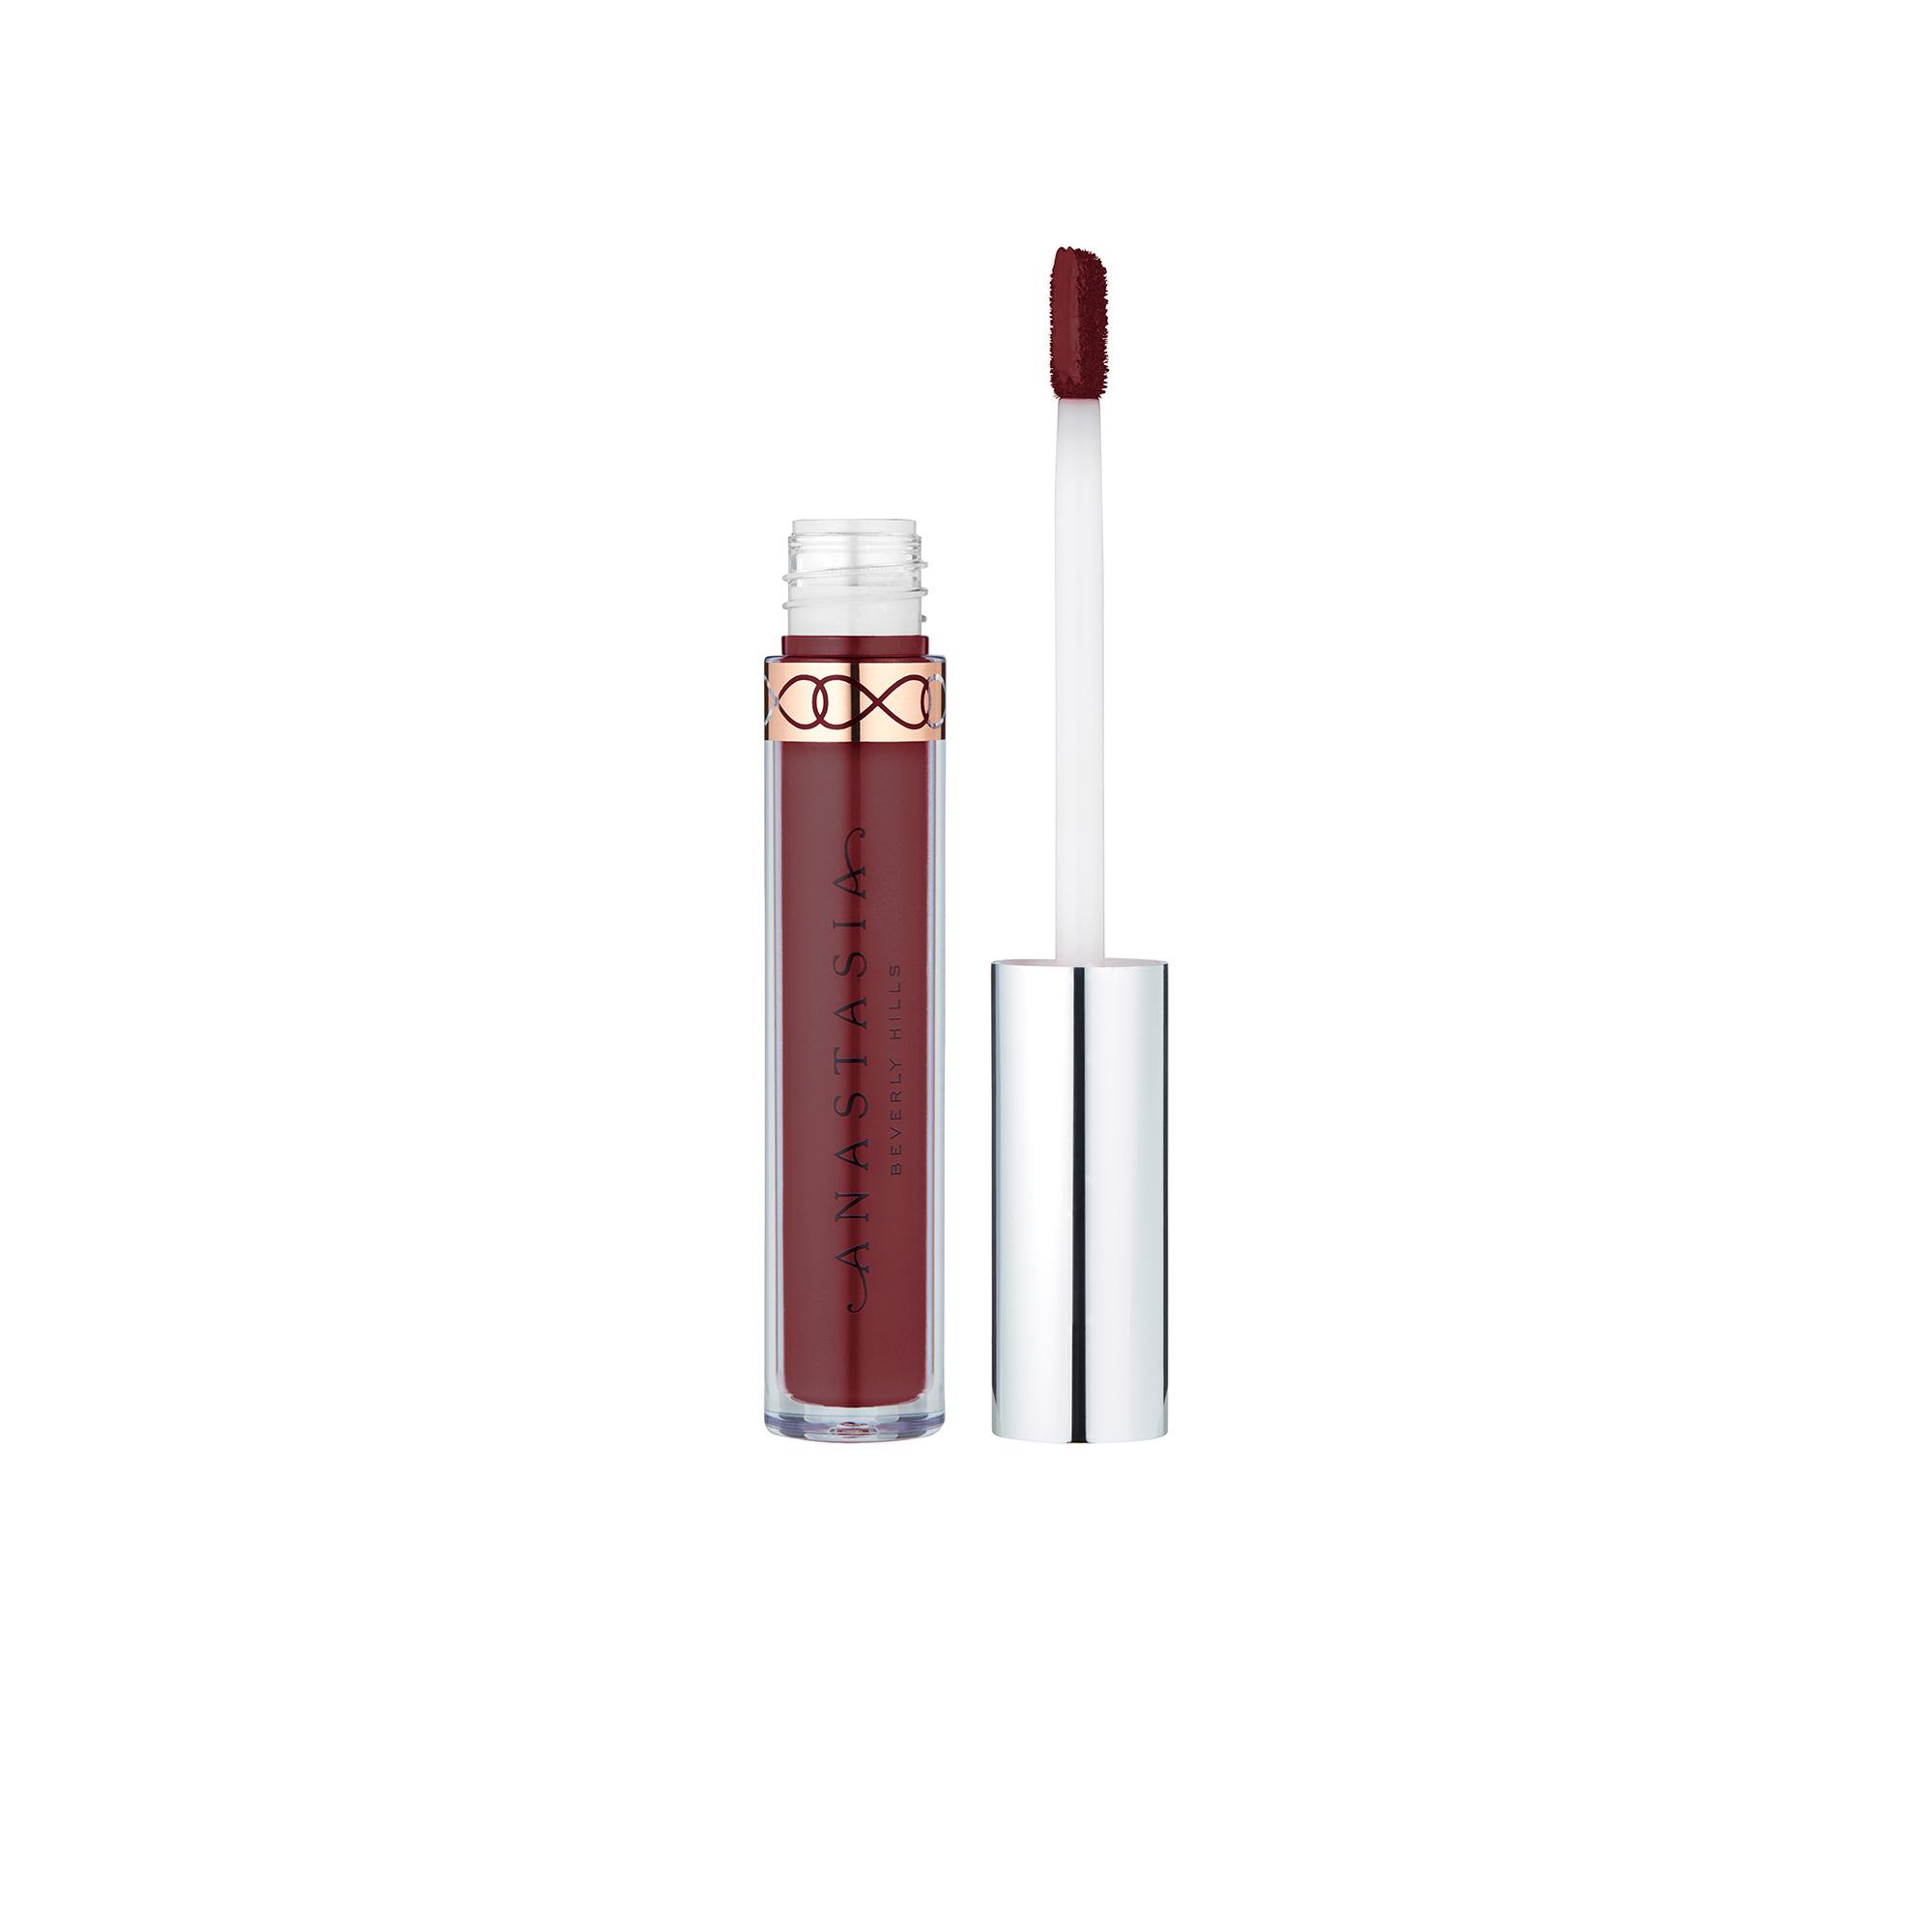 anastasiabeverlyhills.com - Liquid Lipstick | Long-Wearing Matte Lipsticks